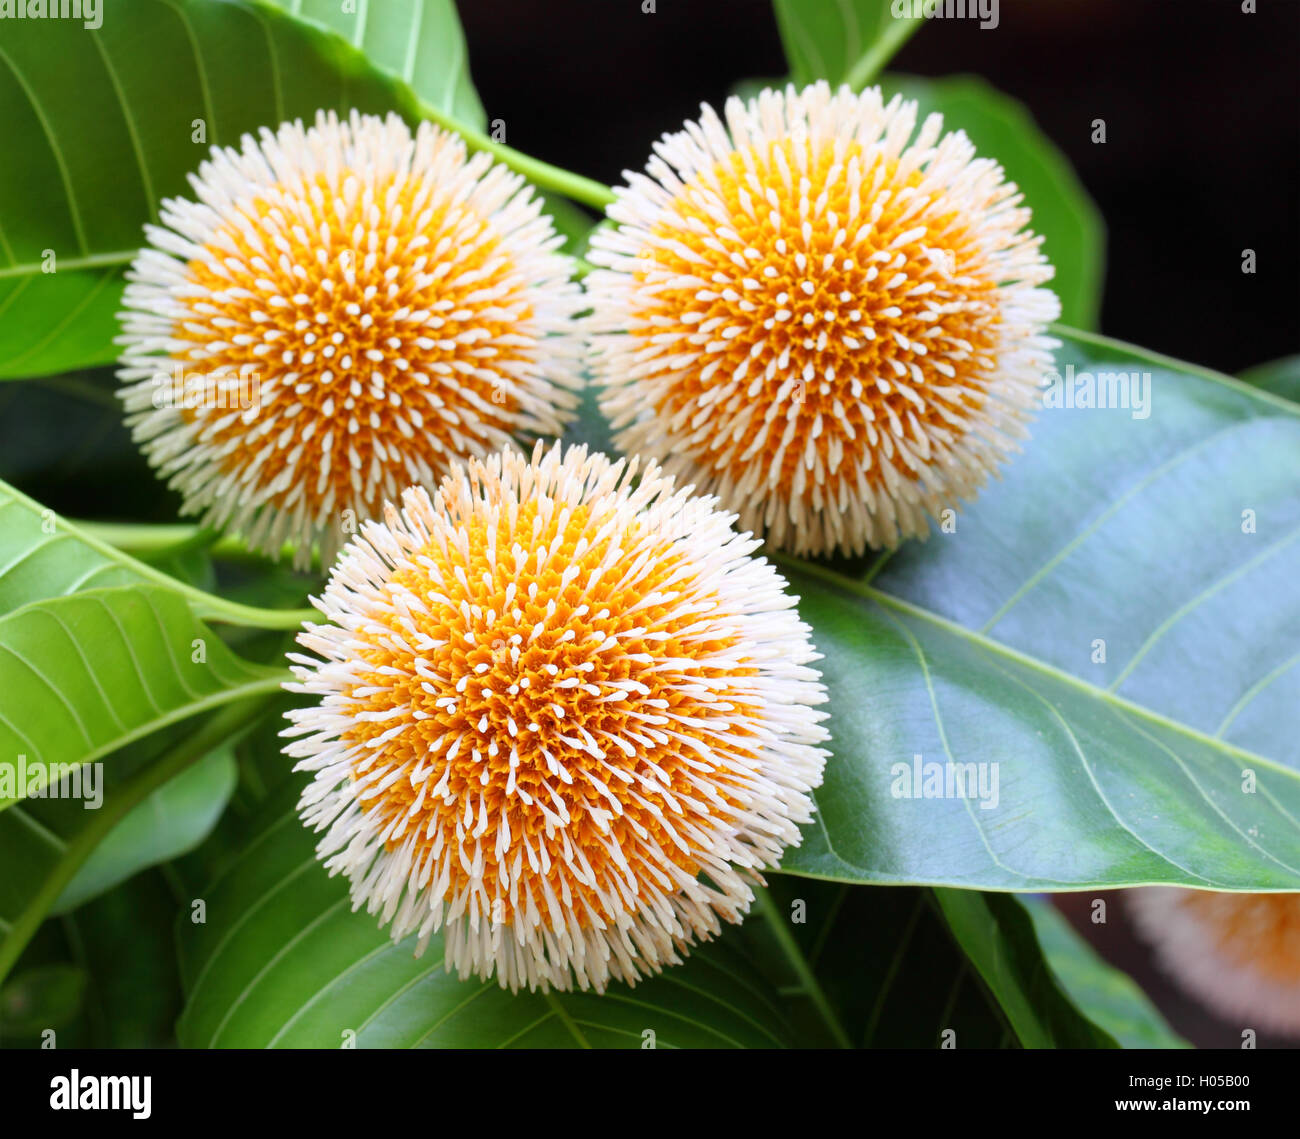 Kodom Flower Stock Photos & Kodom Flower Stock Images